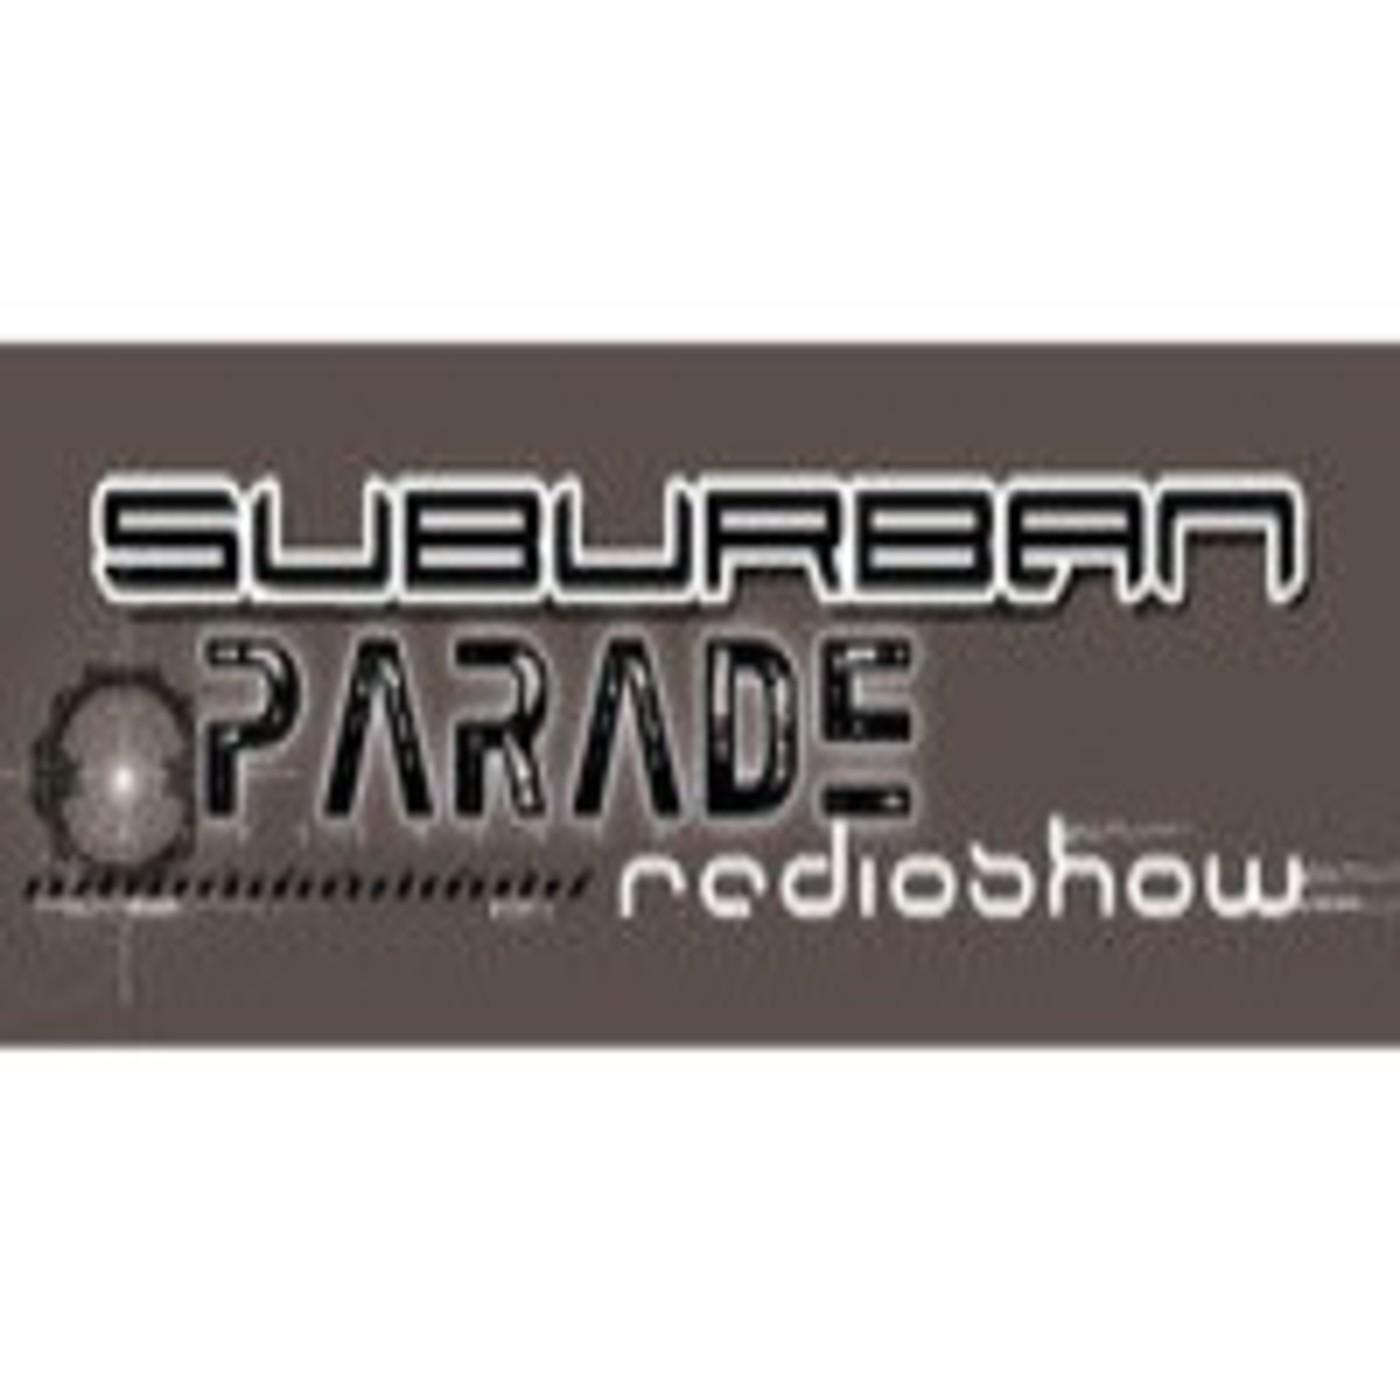 <![CDATA[SuburbanParade RadioShow]]>